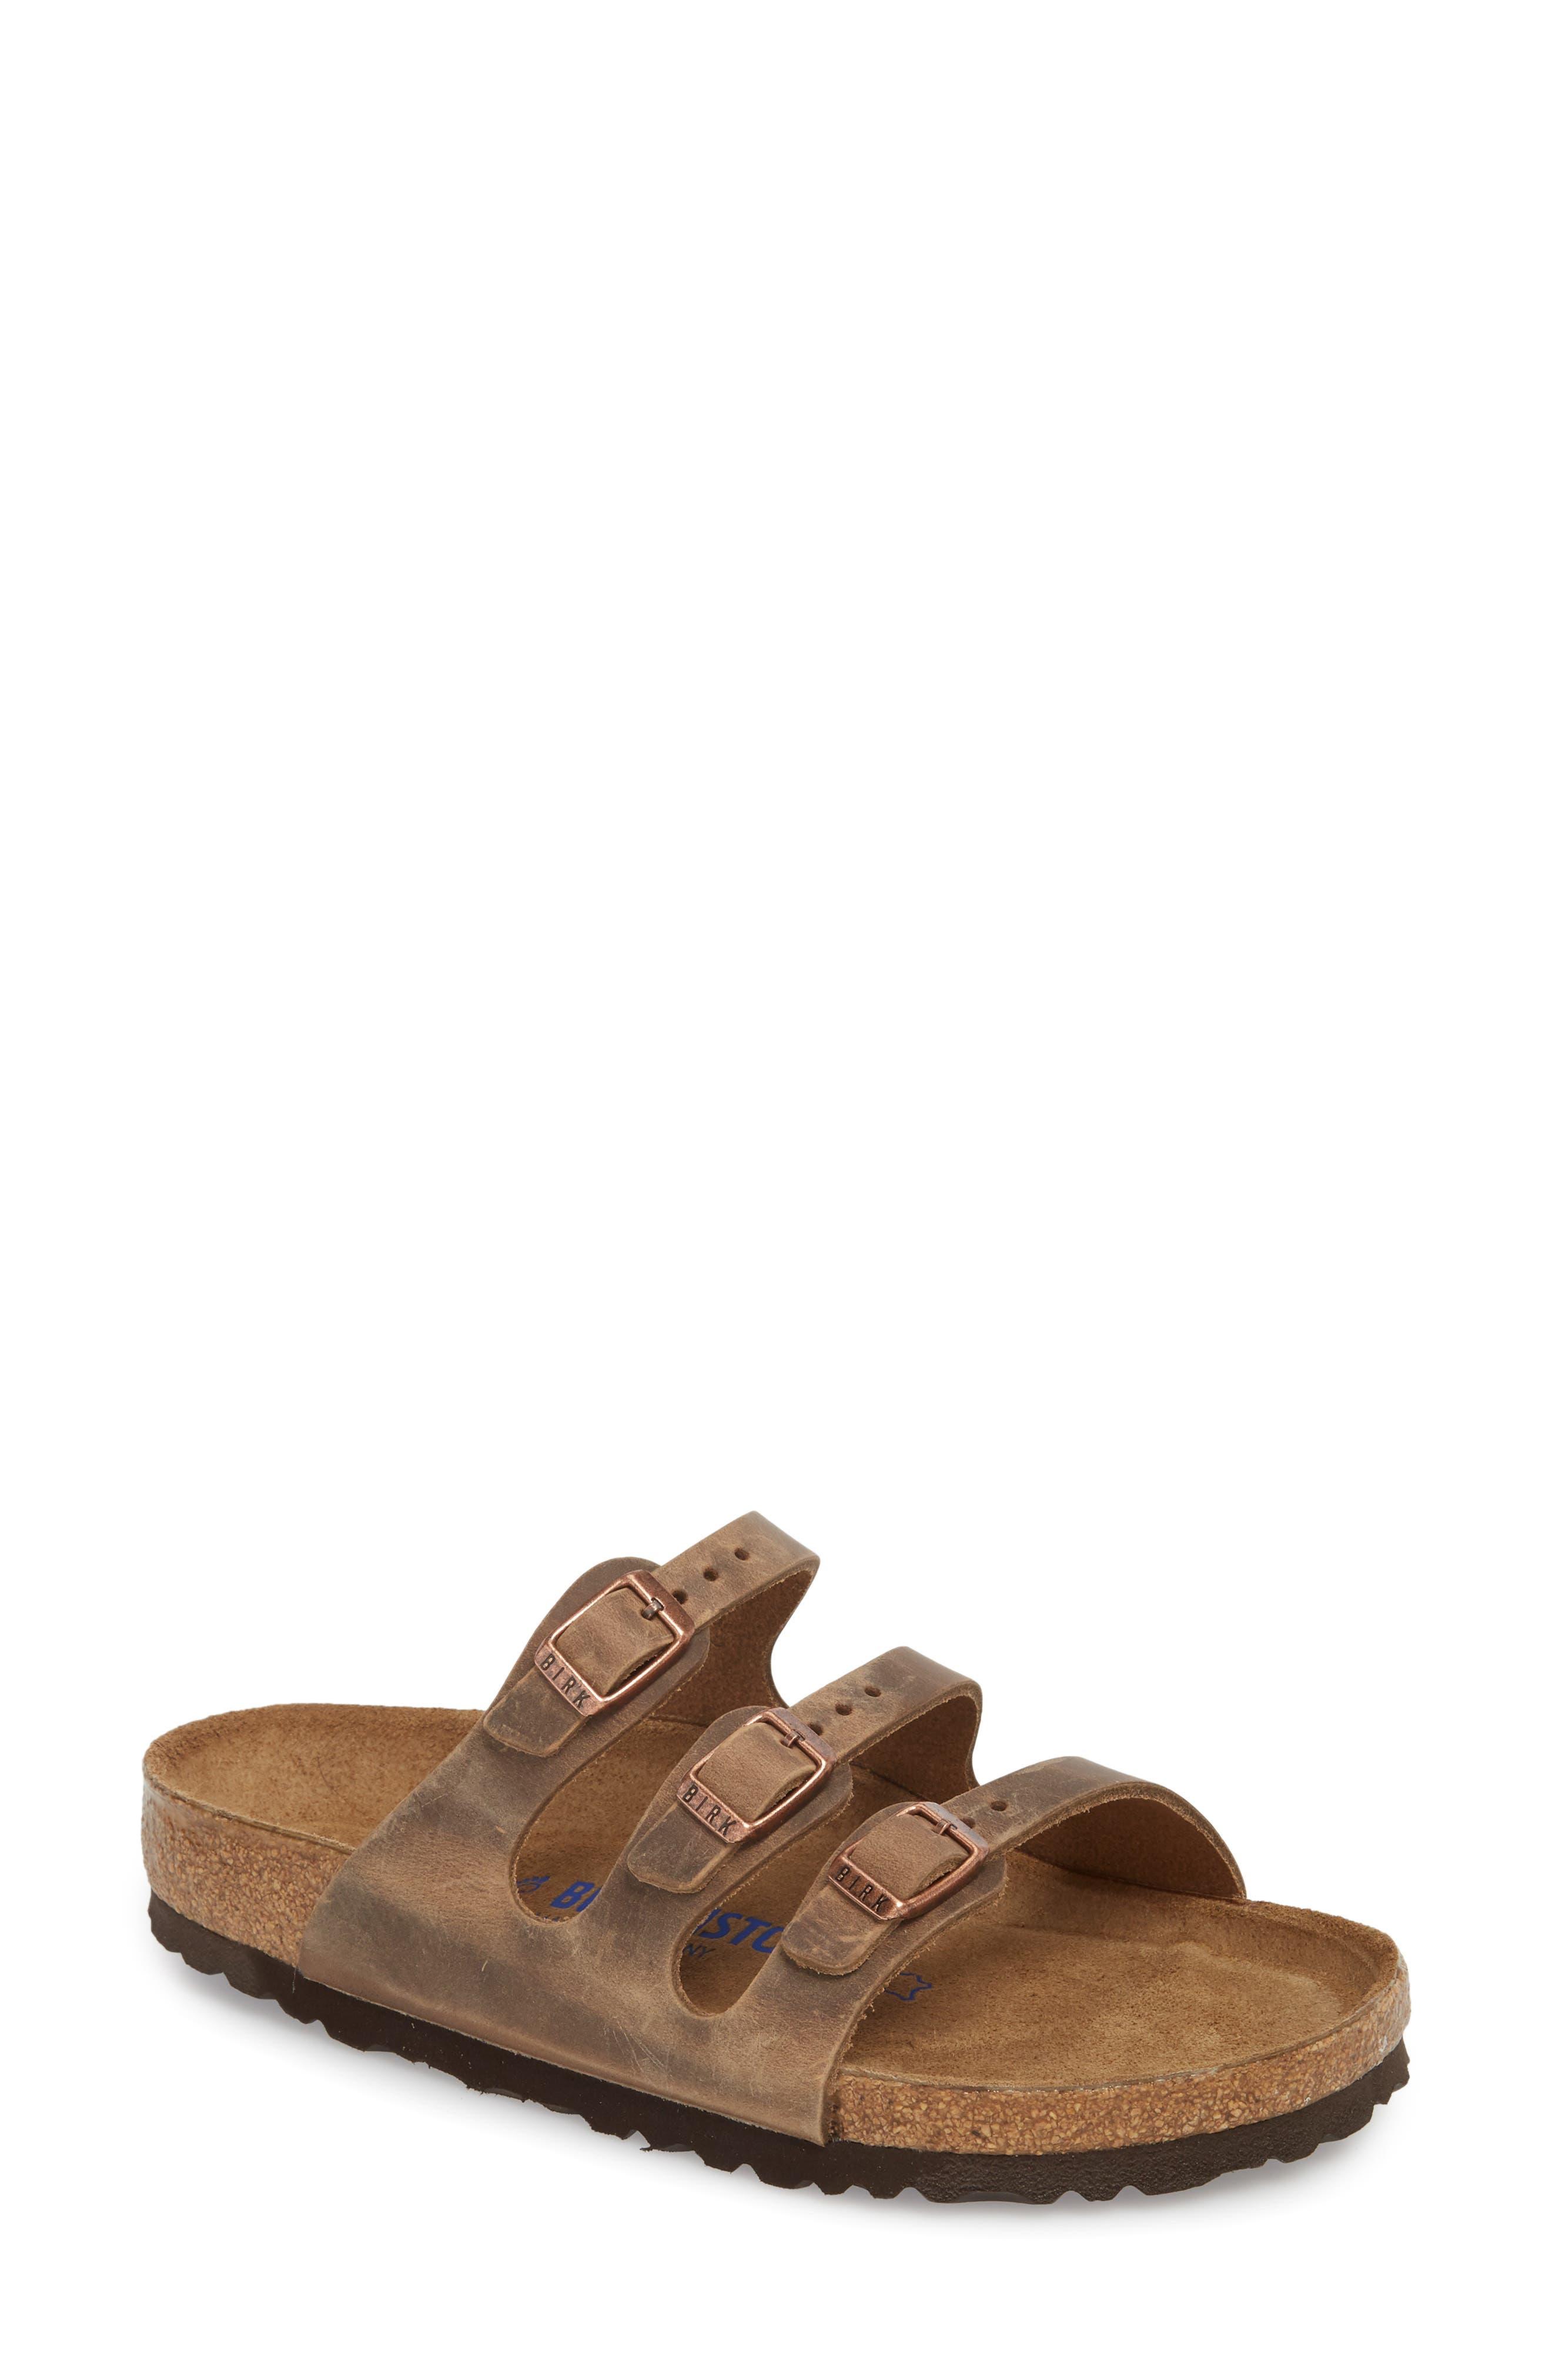 Florida Sandal,                             Main thumbnail 1, color,                             Tobacco Oiled Leather